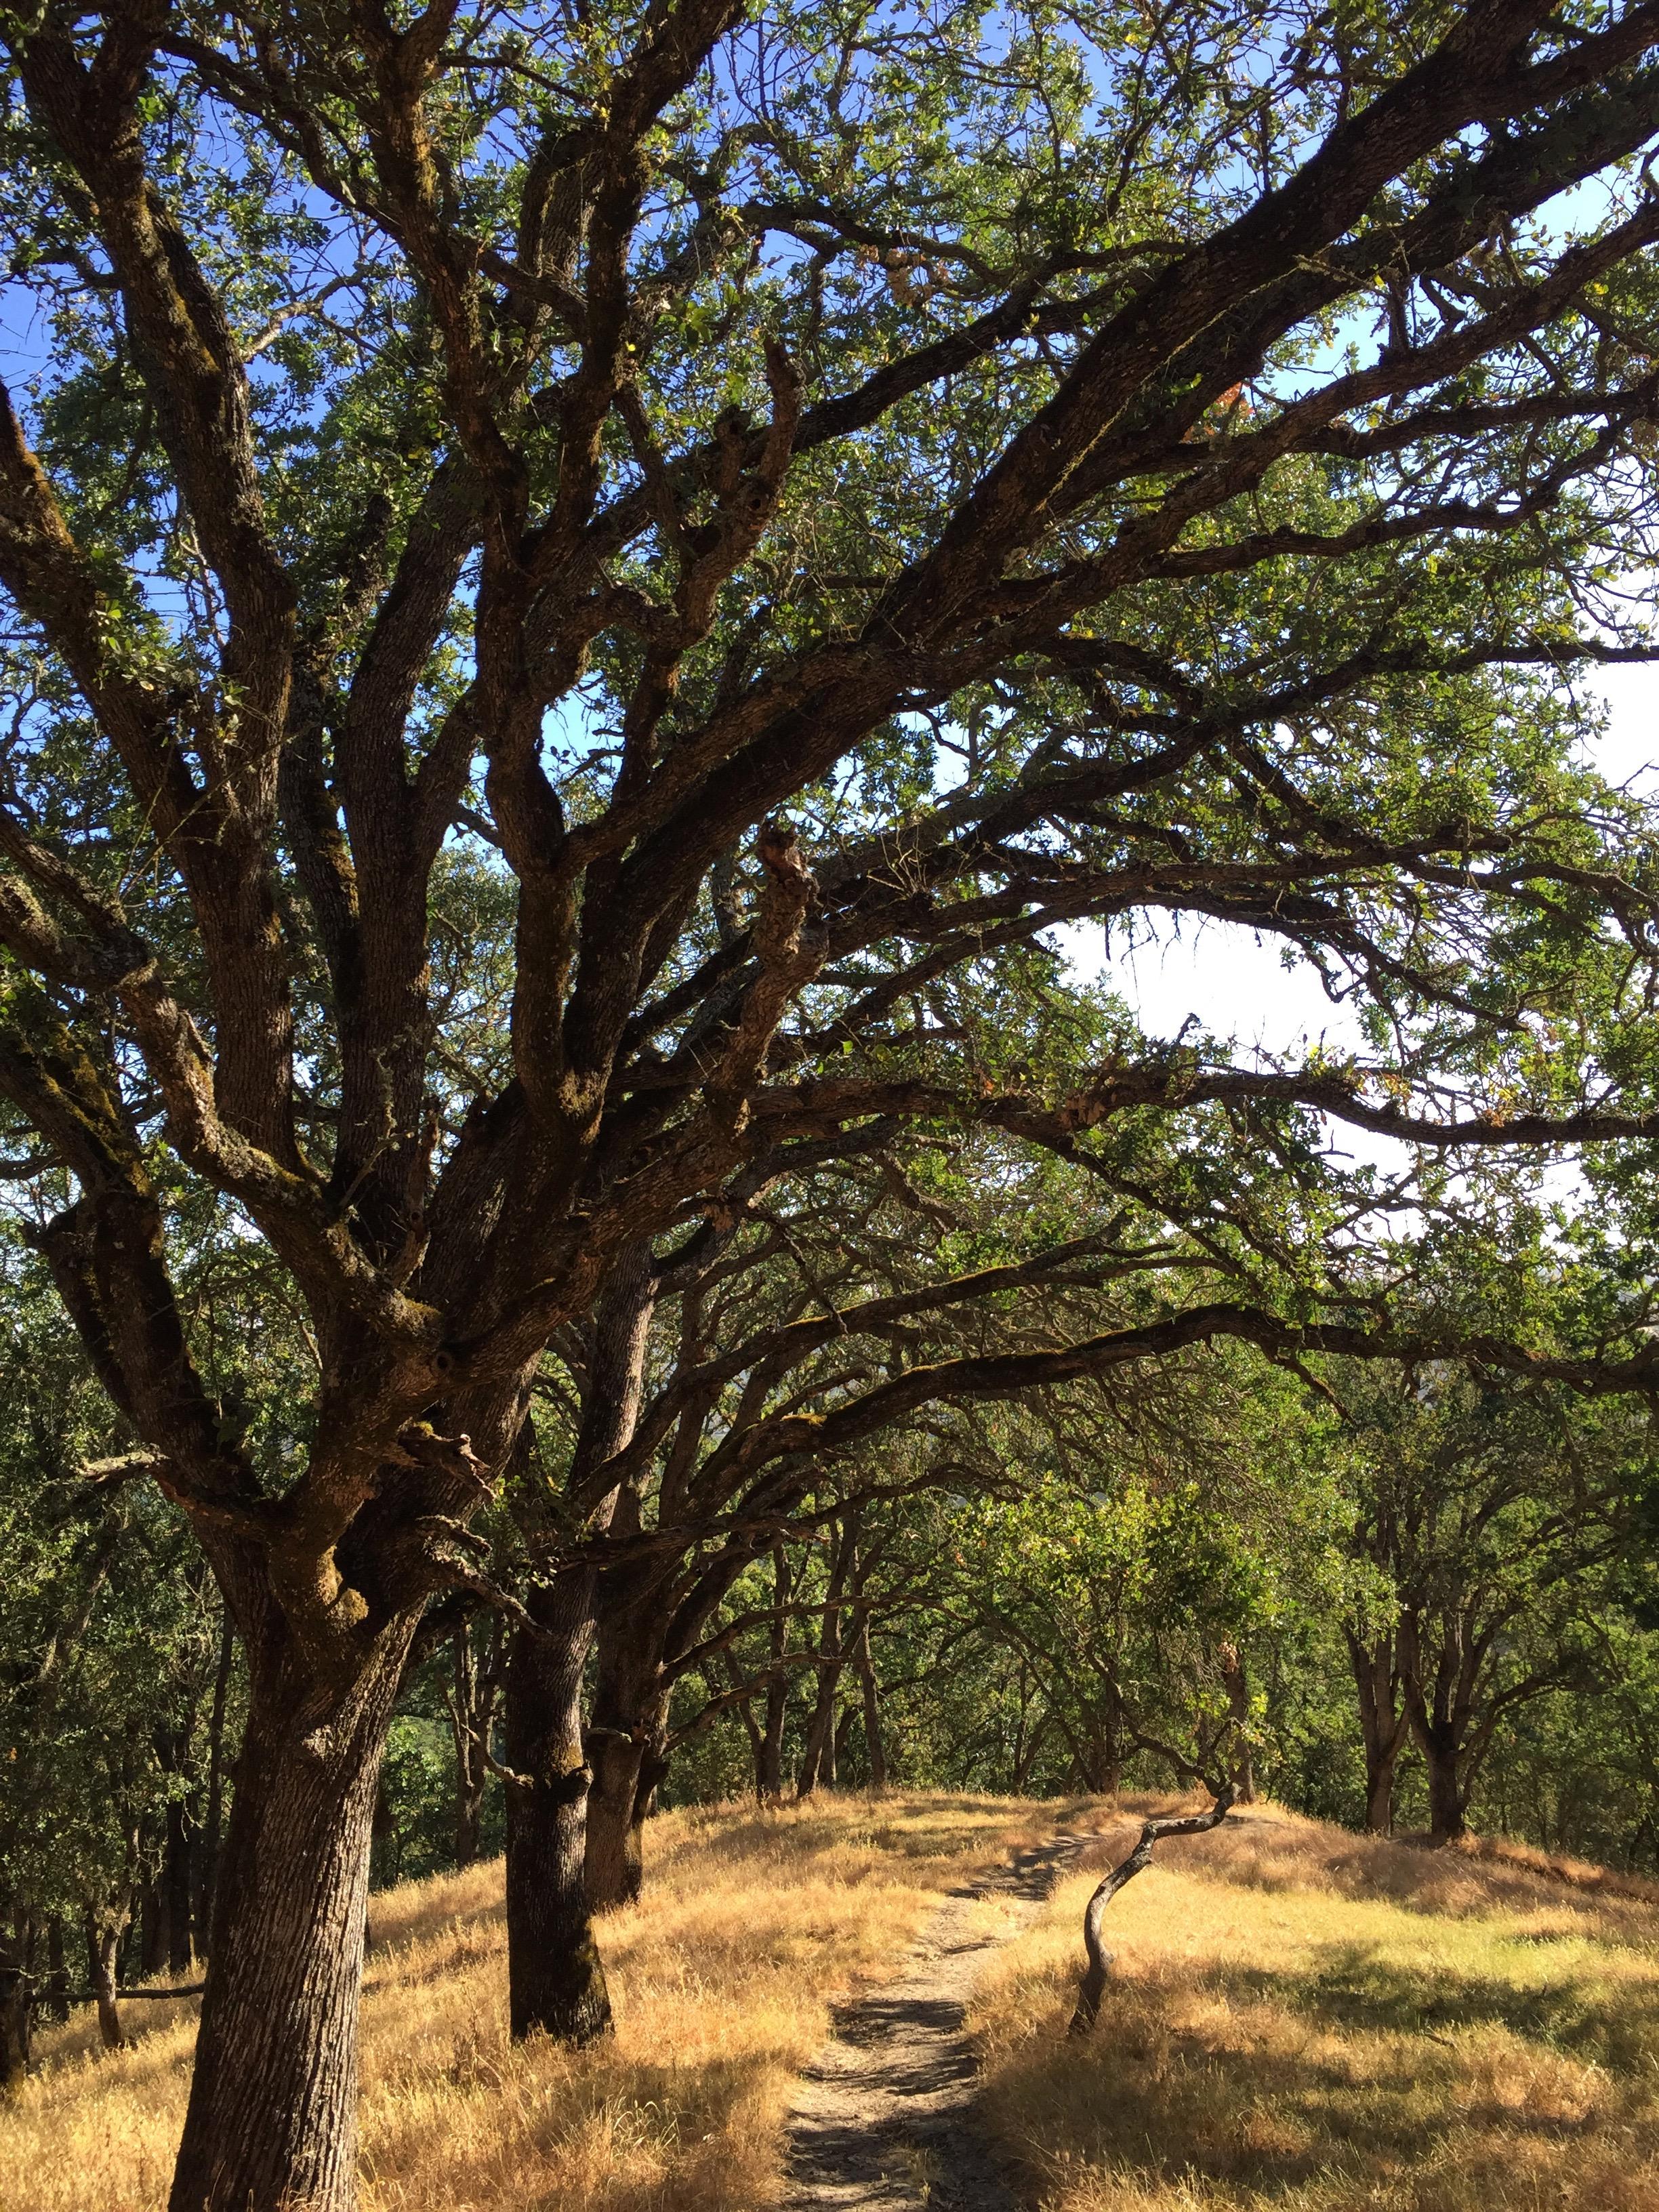 Ringtail Cat trail, Las Trampas Regional Wilderness